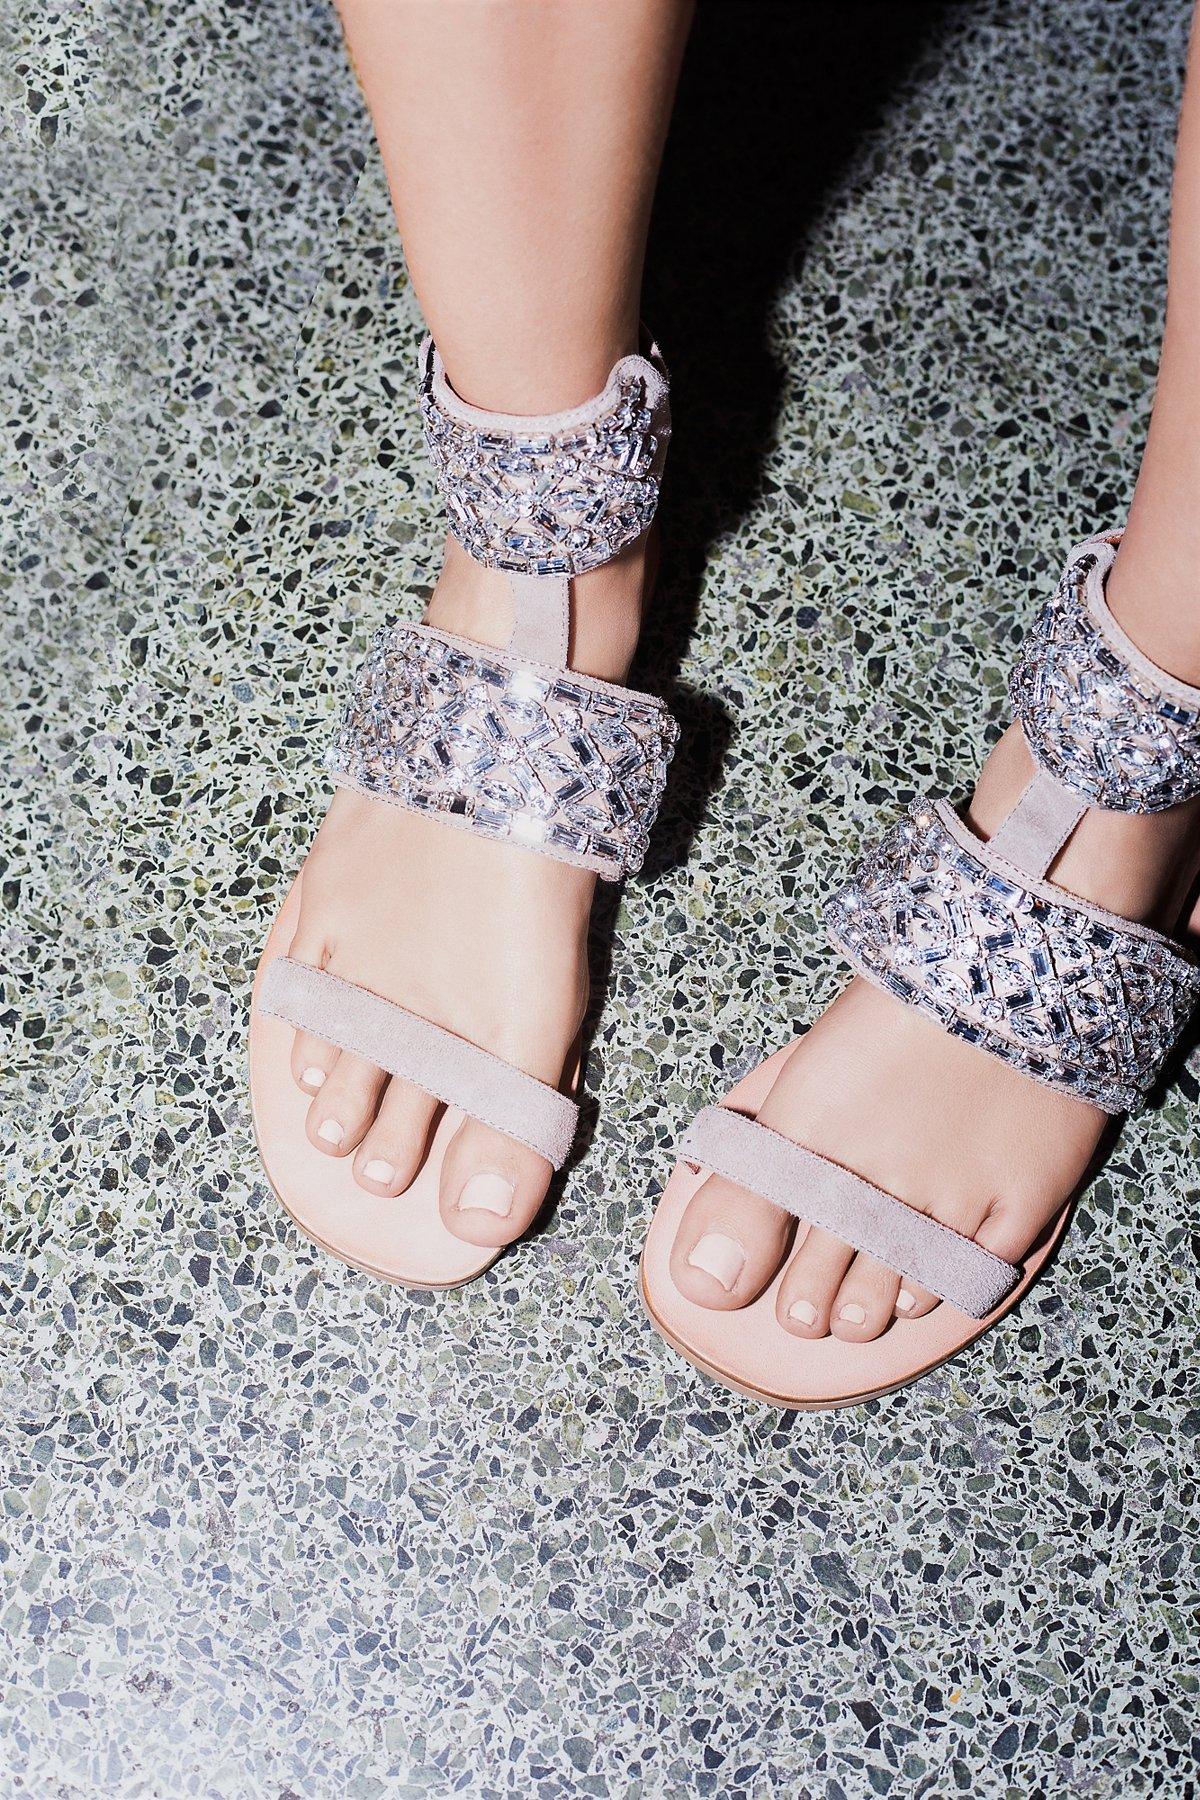 All That Sparkles凉鞋